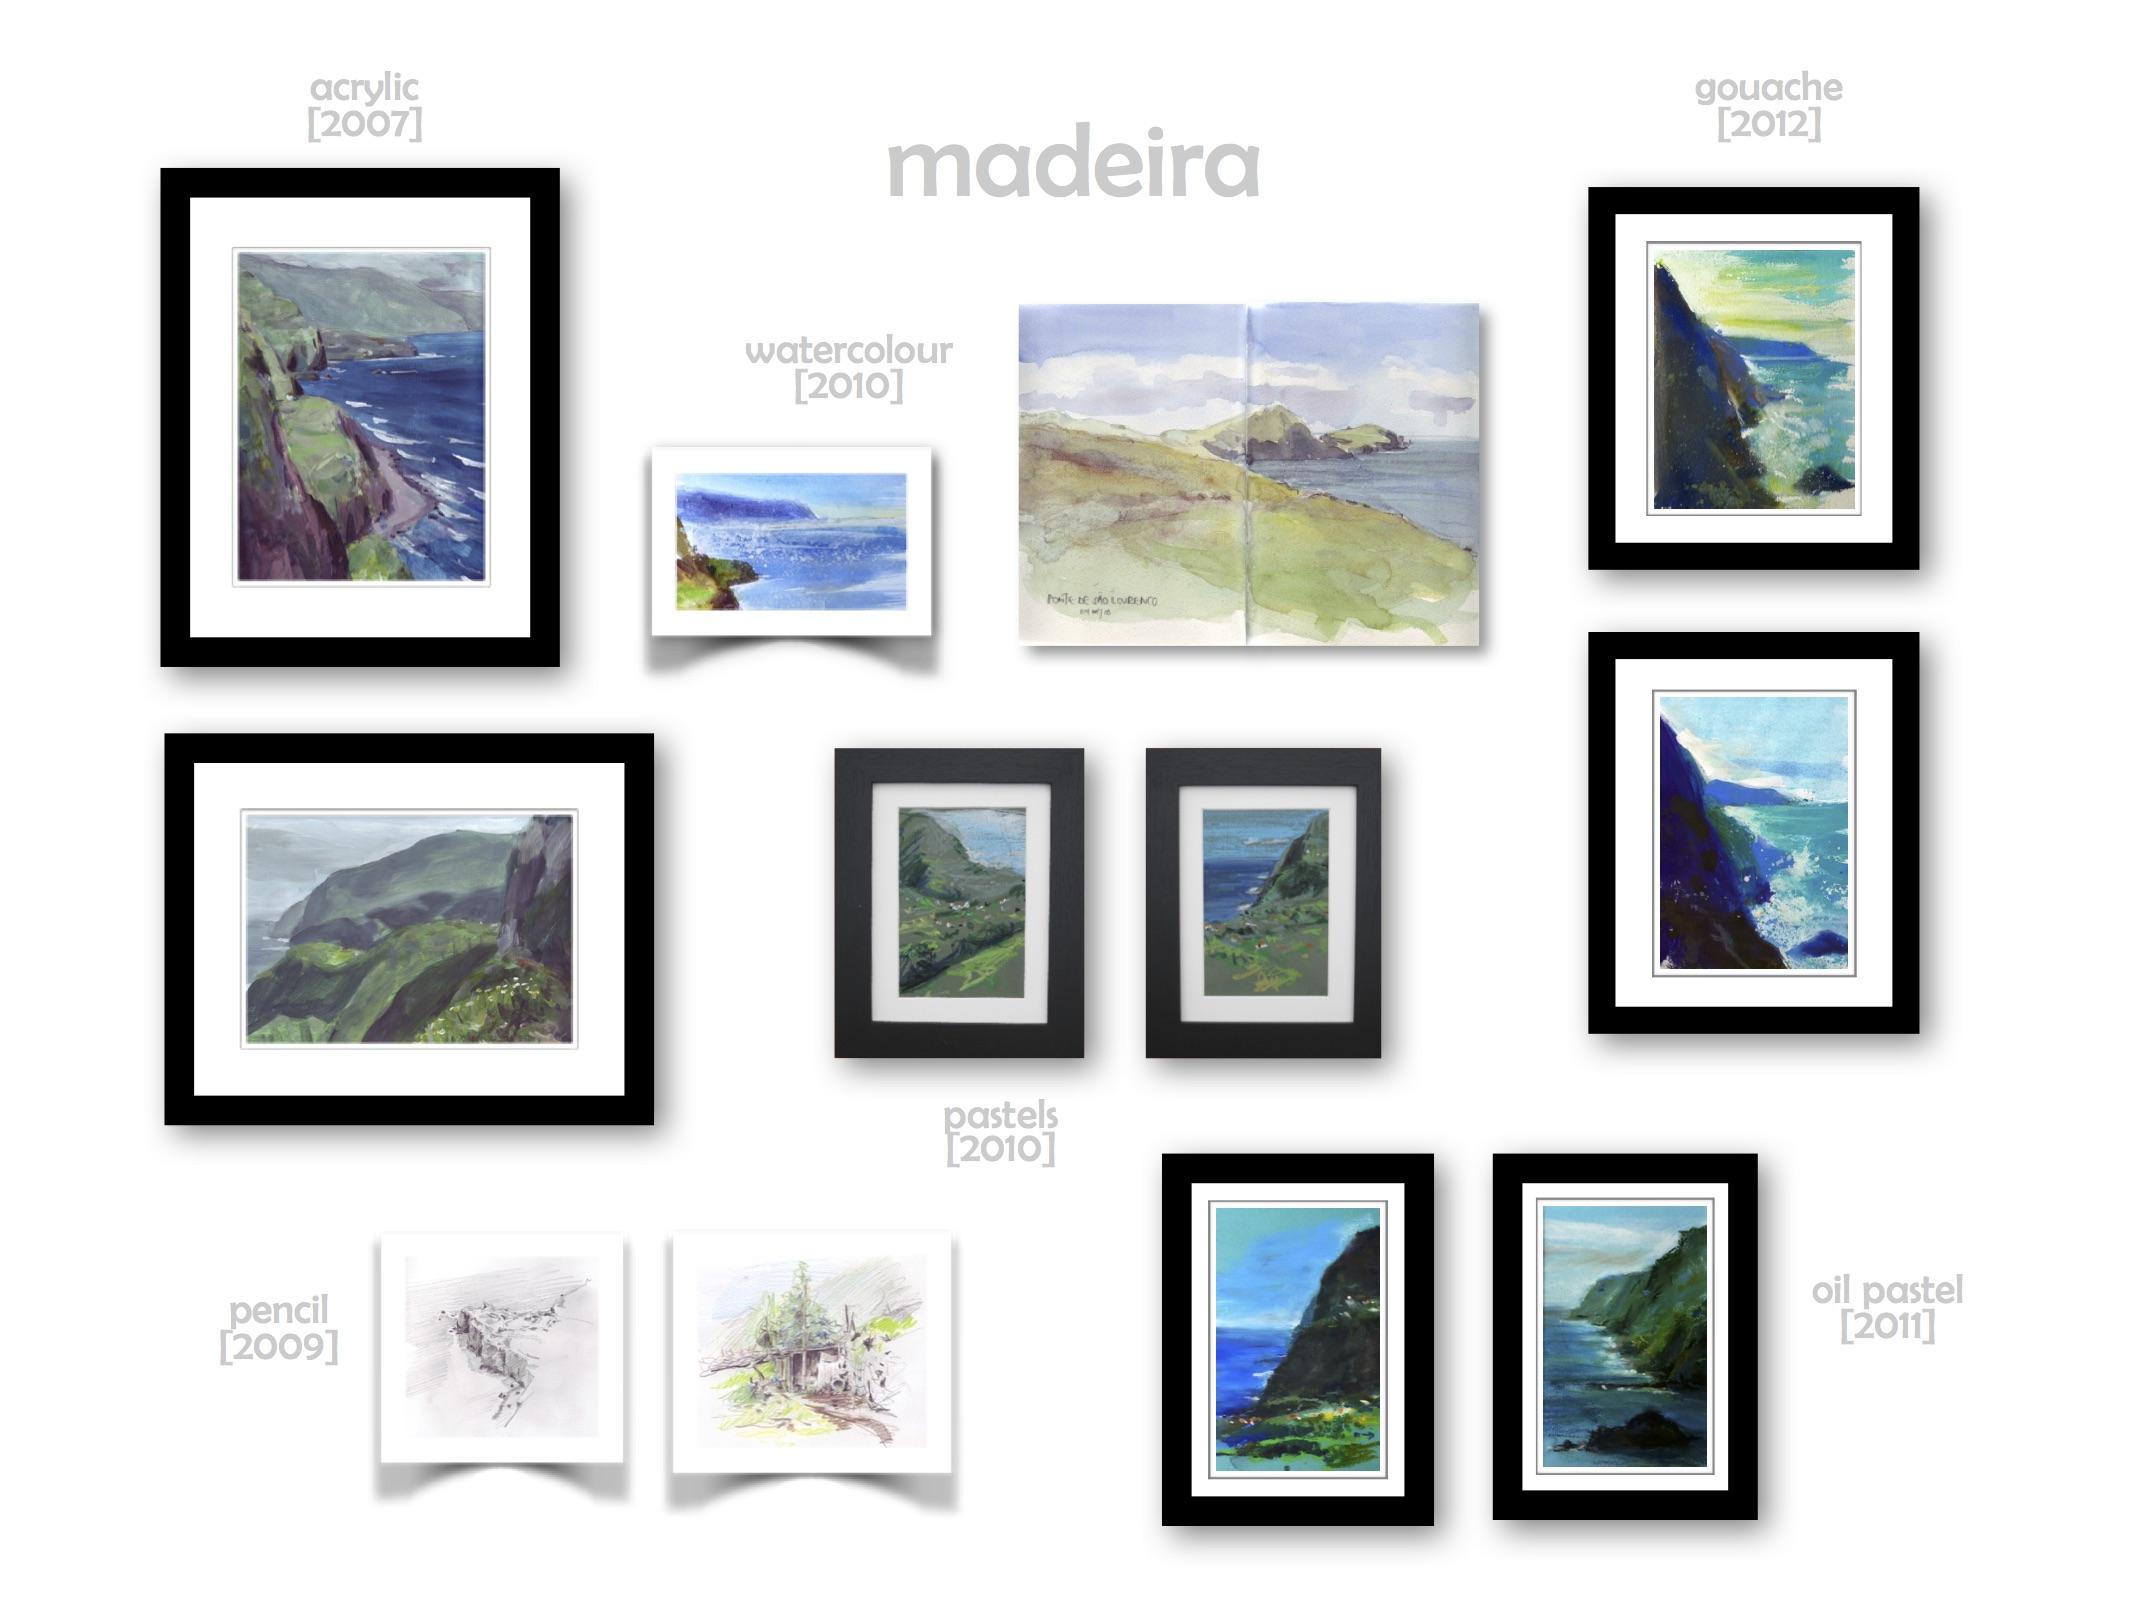 Web Gallery - Madeira